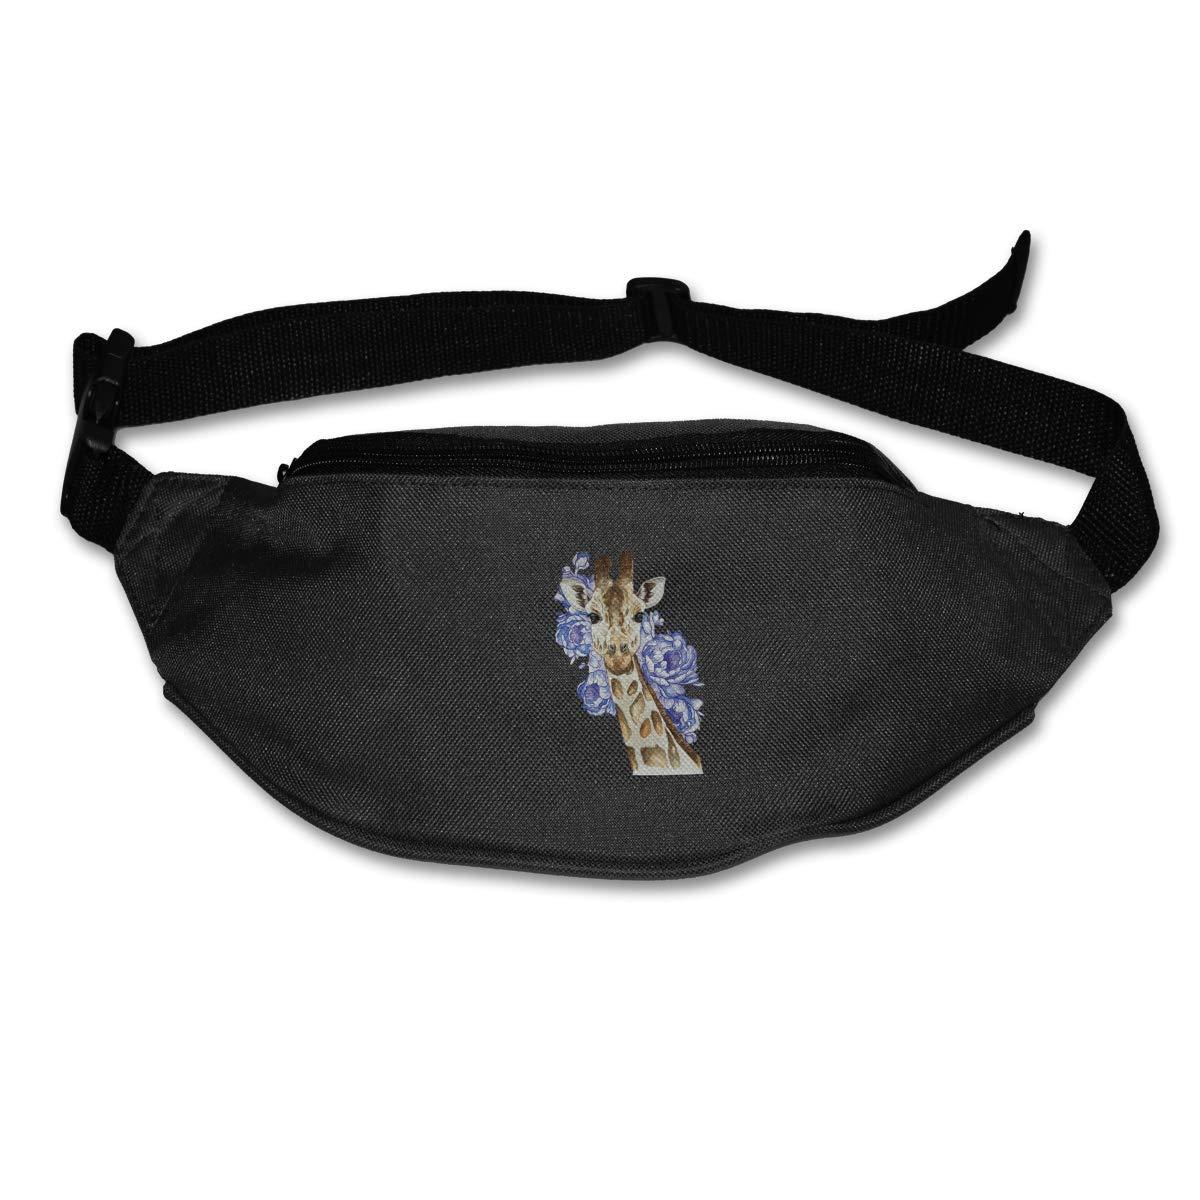 Giraffe Waterproof Sport Waist Bag Fanny Pack Adjustable For Hike